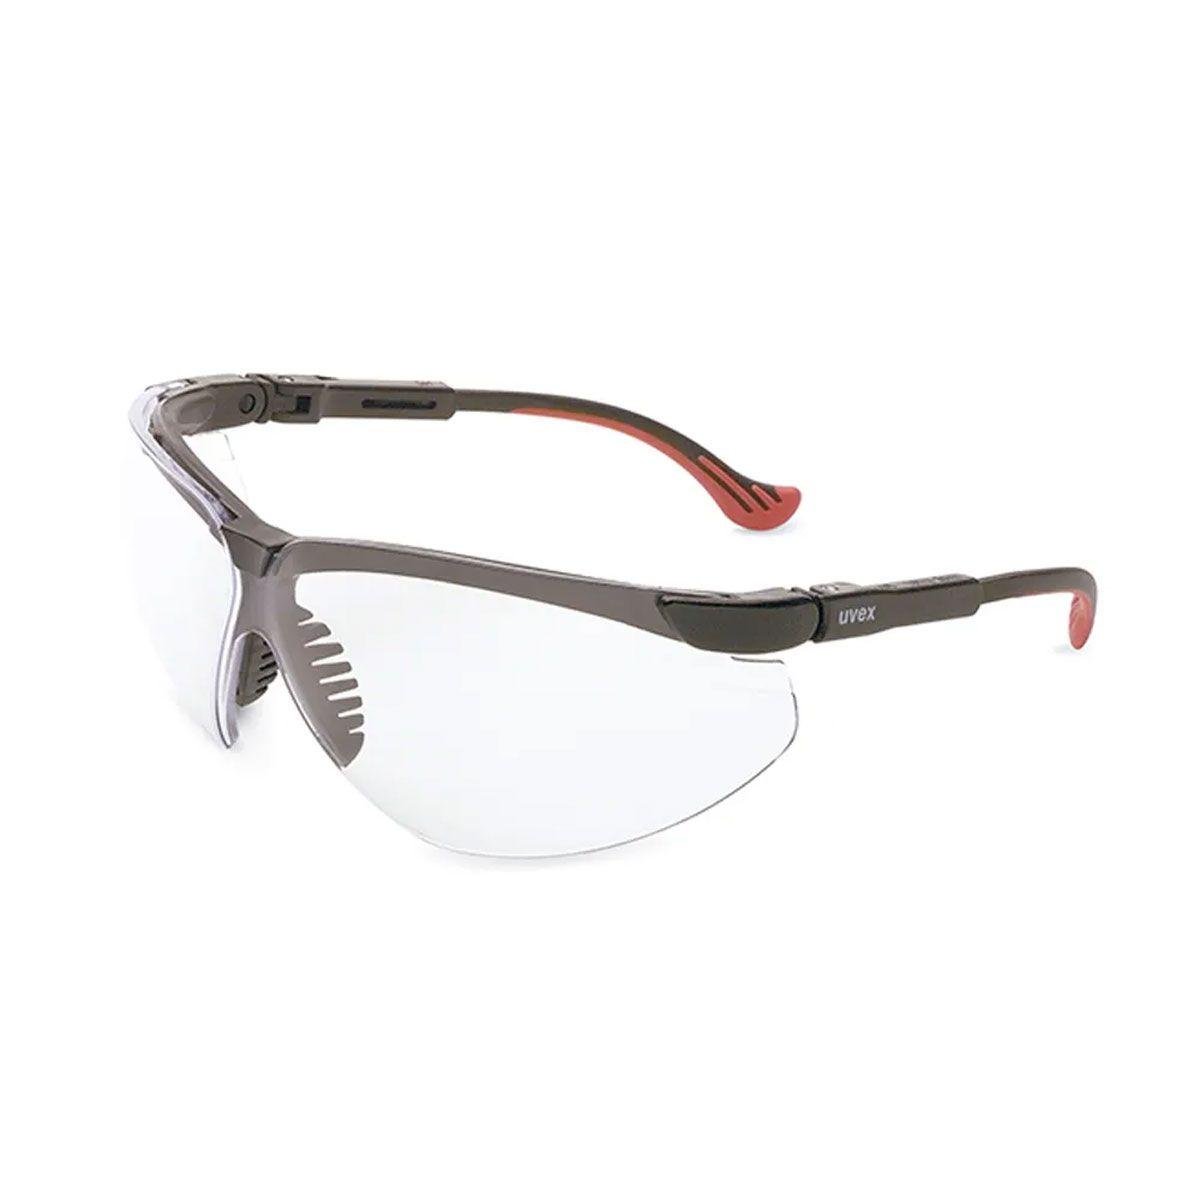 Óculos HoneyWell Uvex Gênesis XC - Lentes Incolor